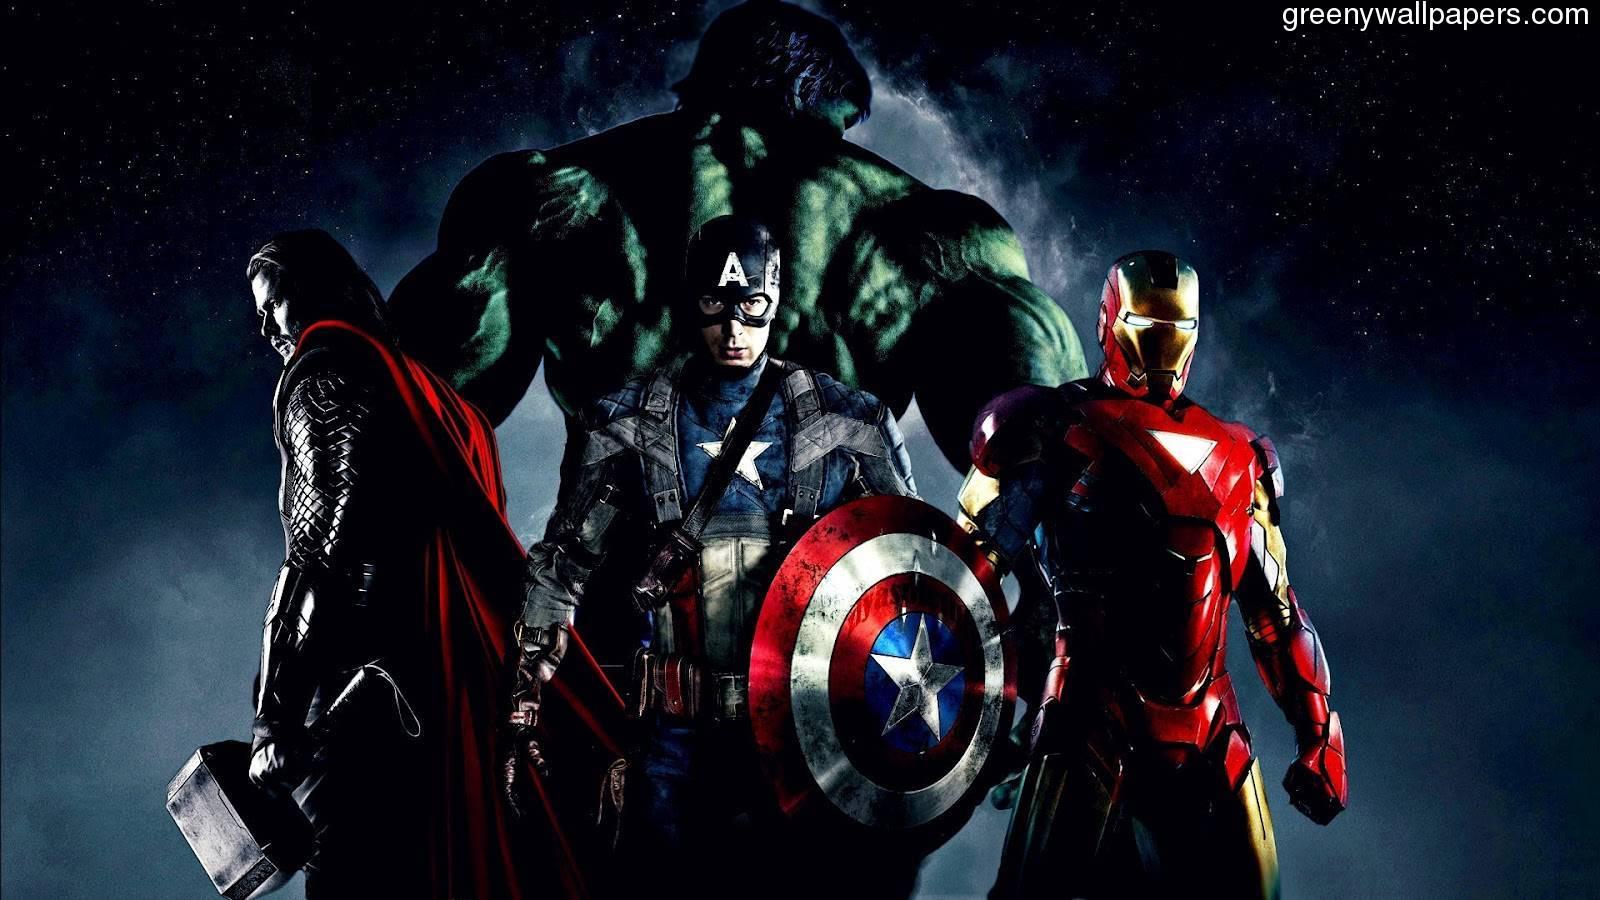 Iron Man Hd Free Wallpaper Download 1600x900